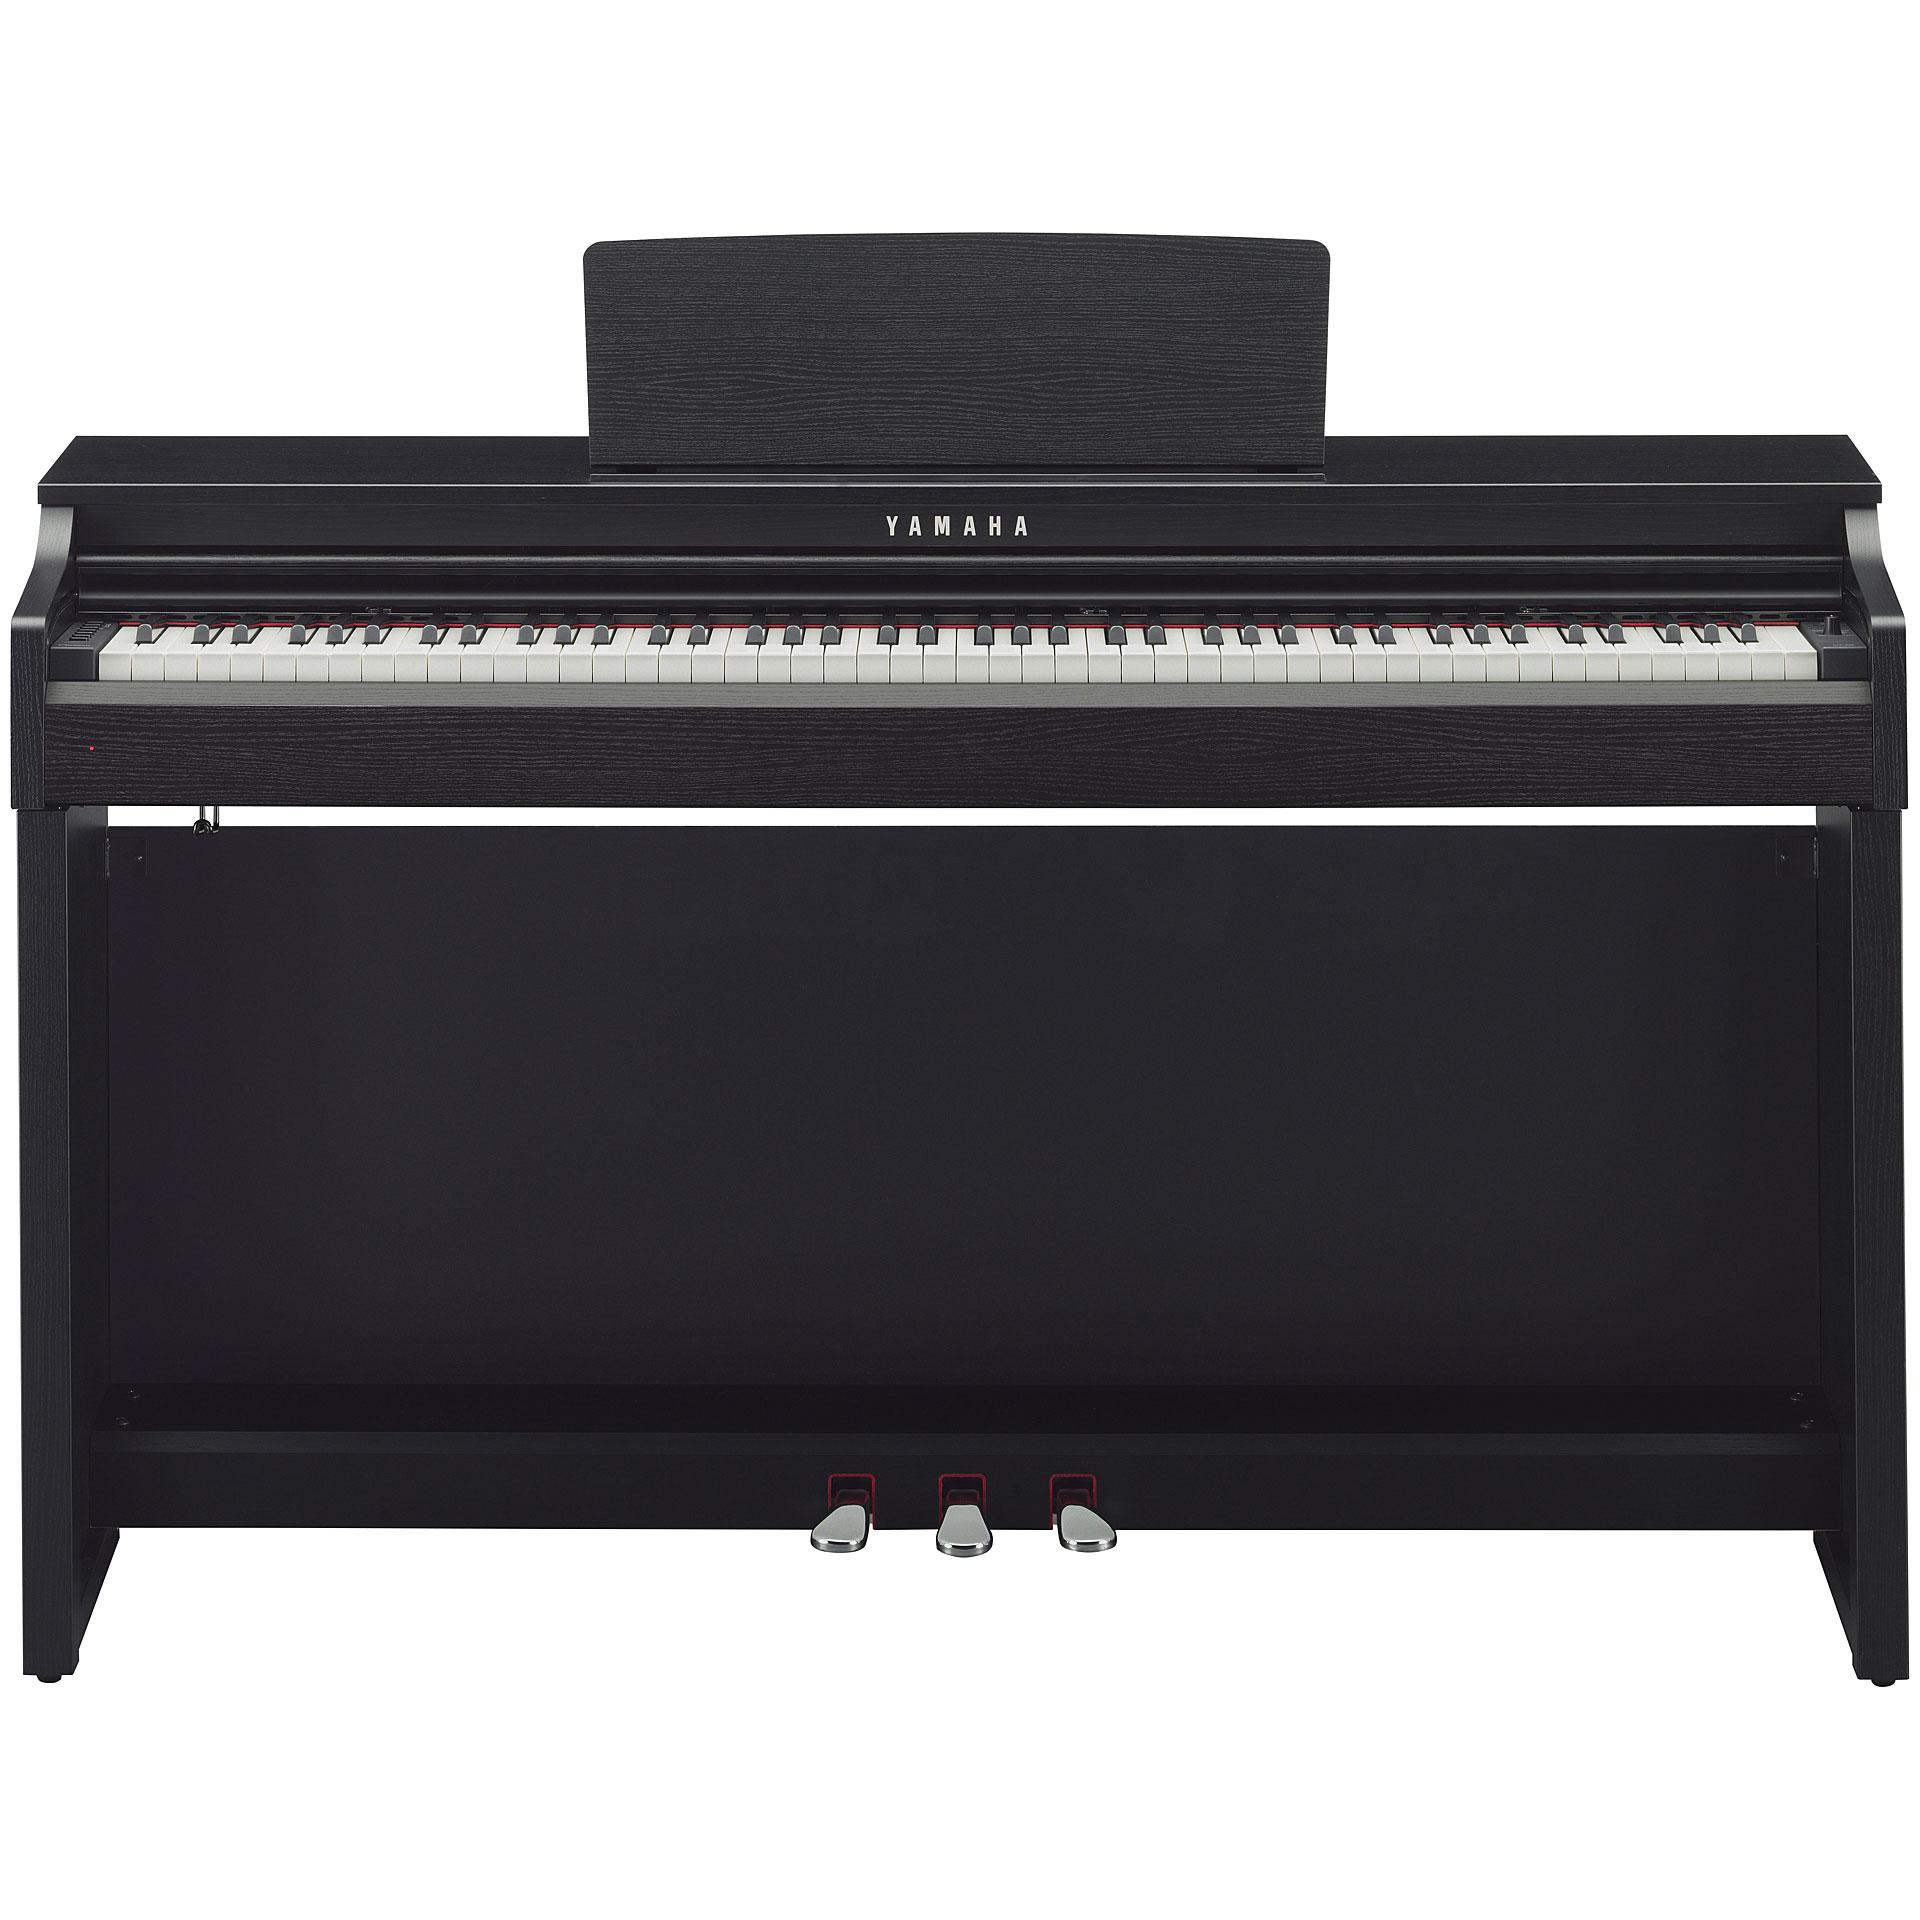 yamaha clavinova clp 525b digital piano. Black Bedroom Furniture Sets. Home Design Ideas